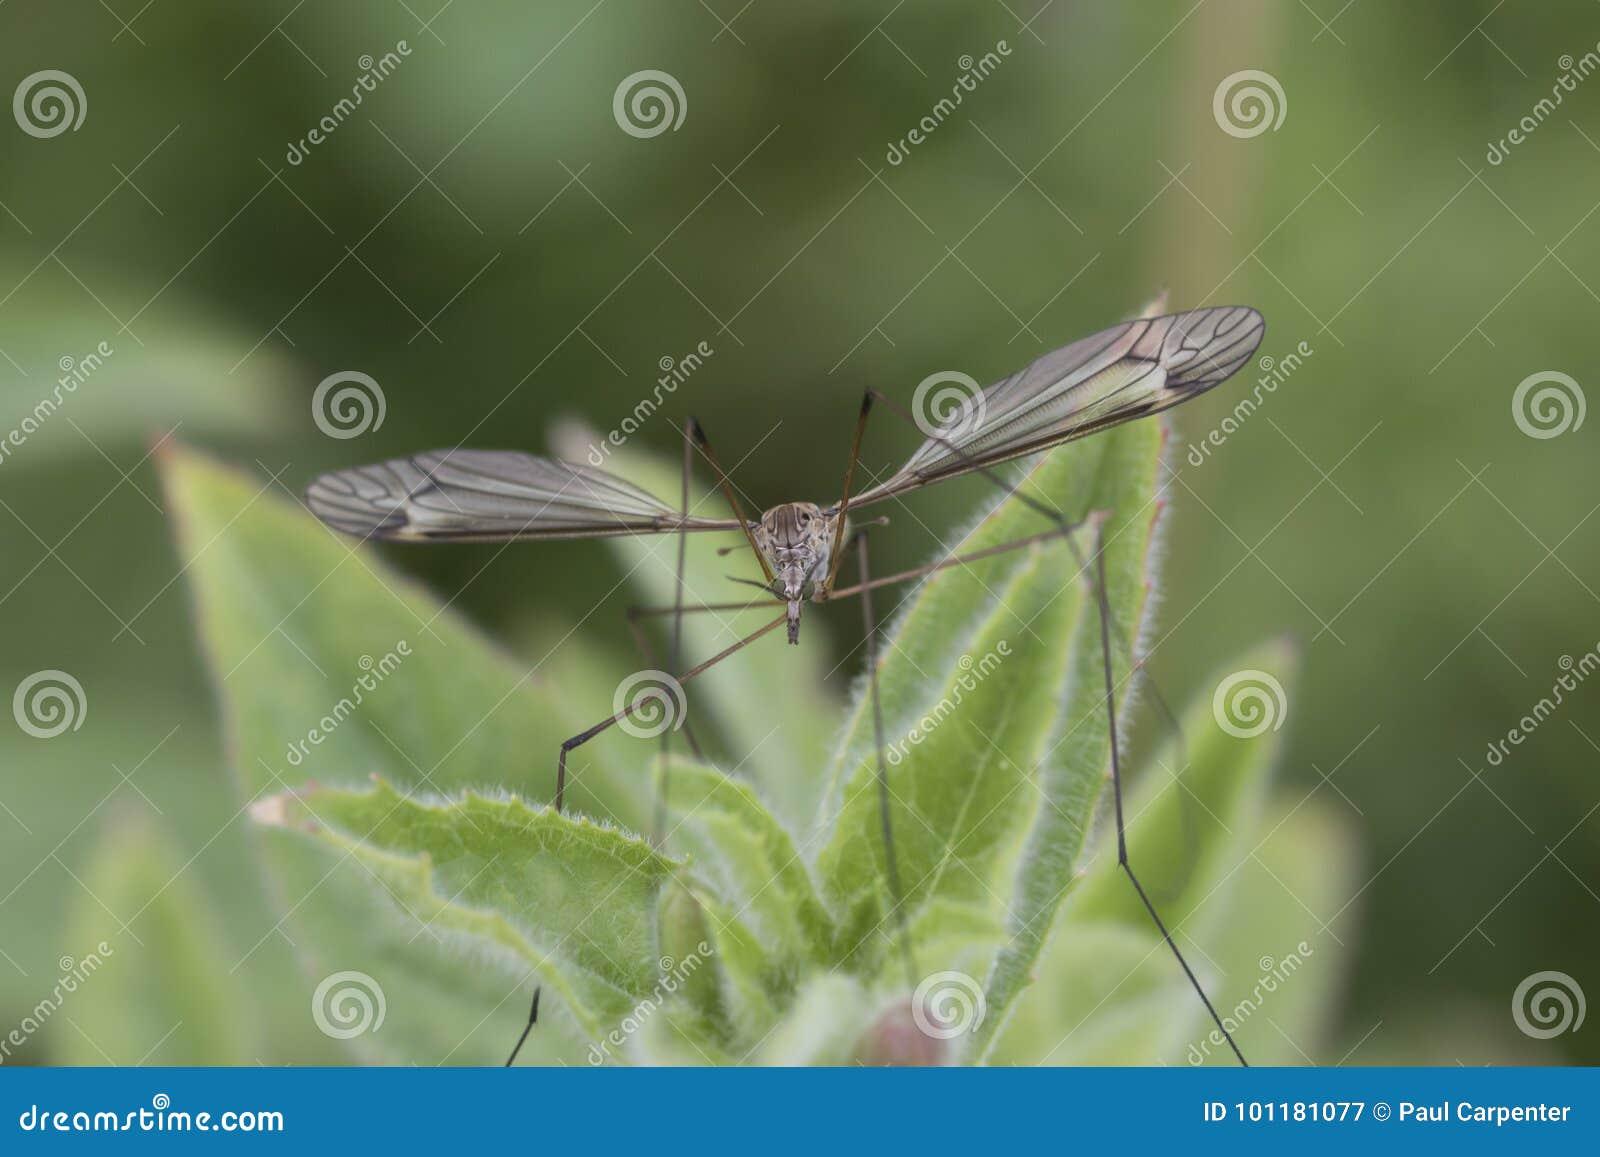 Tiger cranefly portrait